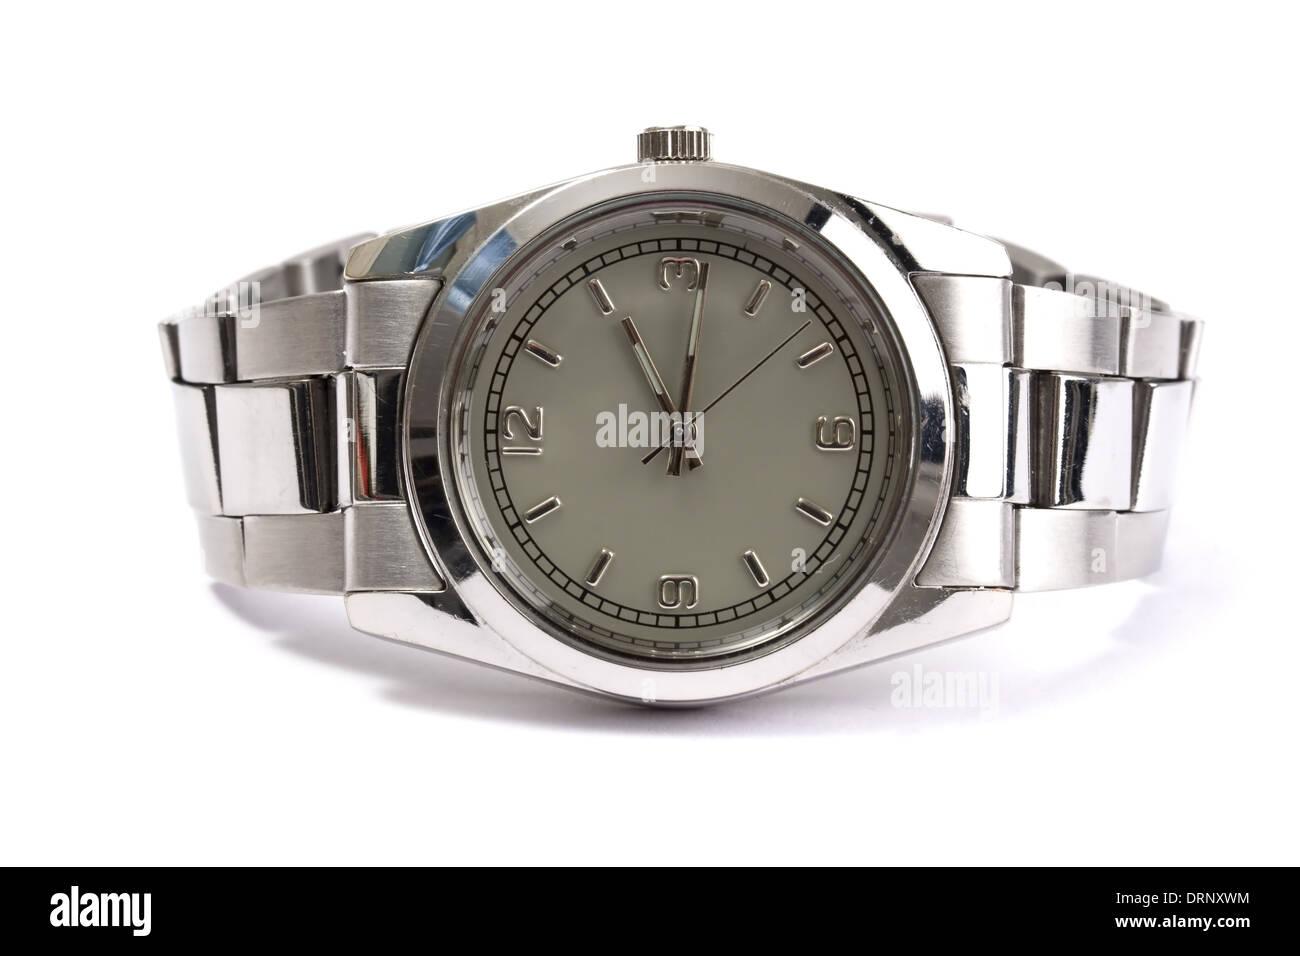 Wristwatch - Stock Image